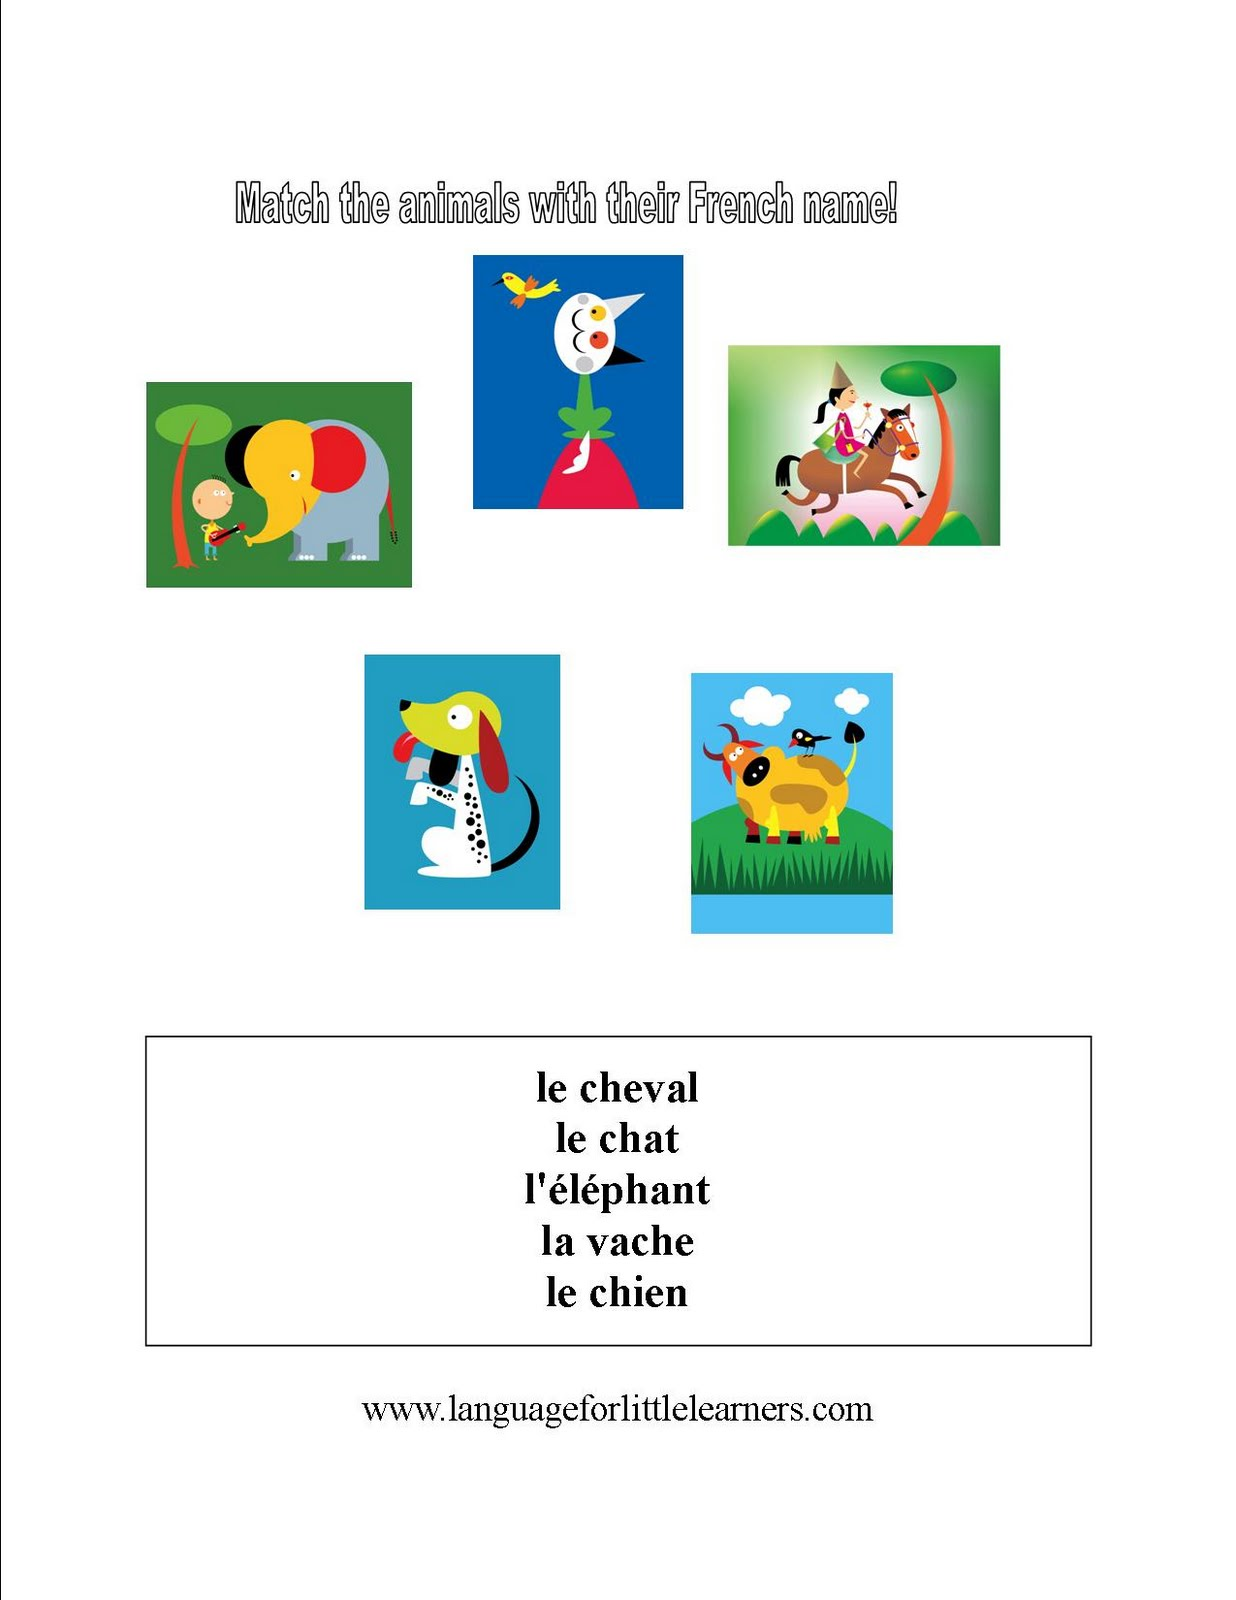 language for little learners french animal worksheet. Black Bedroom Furniture Sets. Home Design Ideas